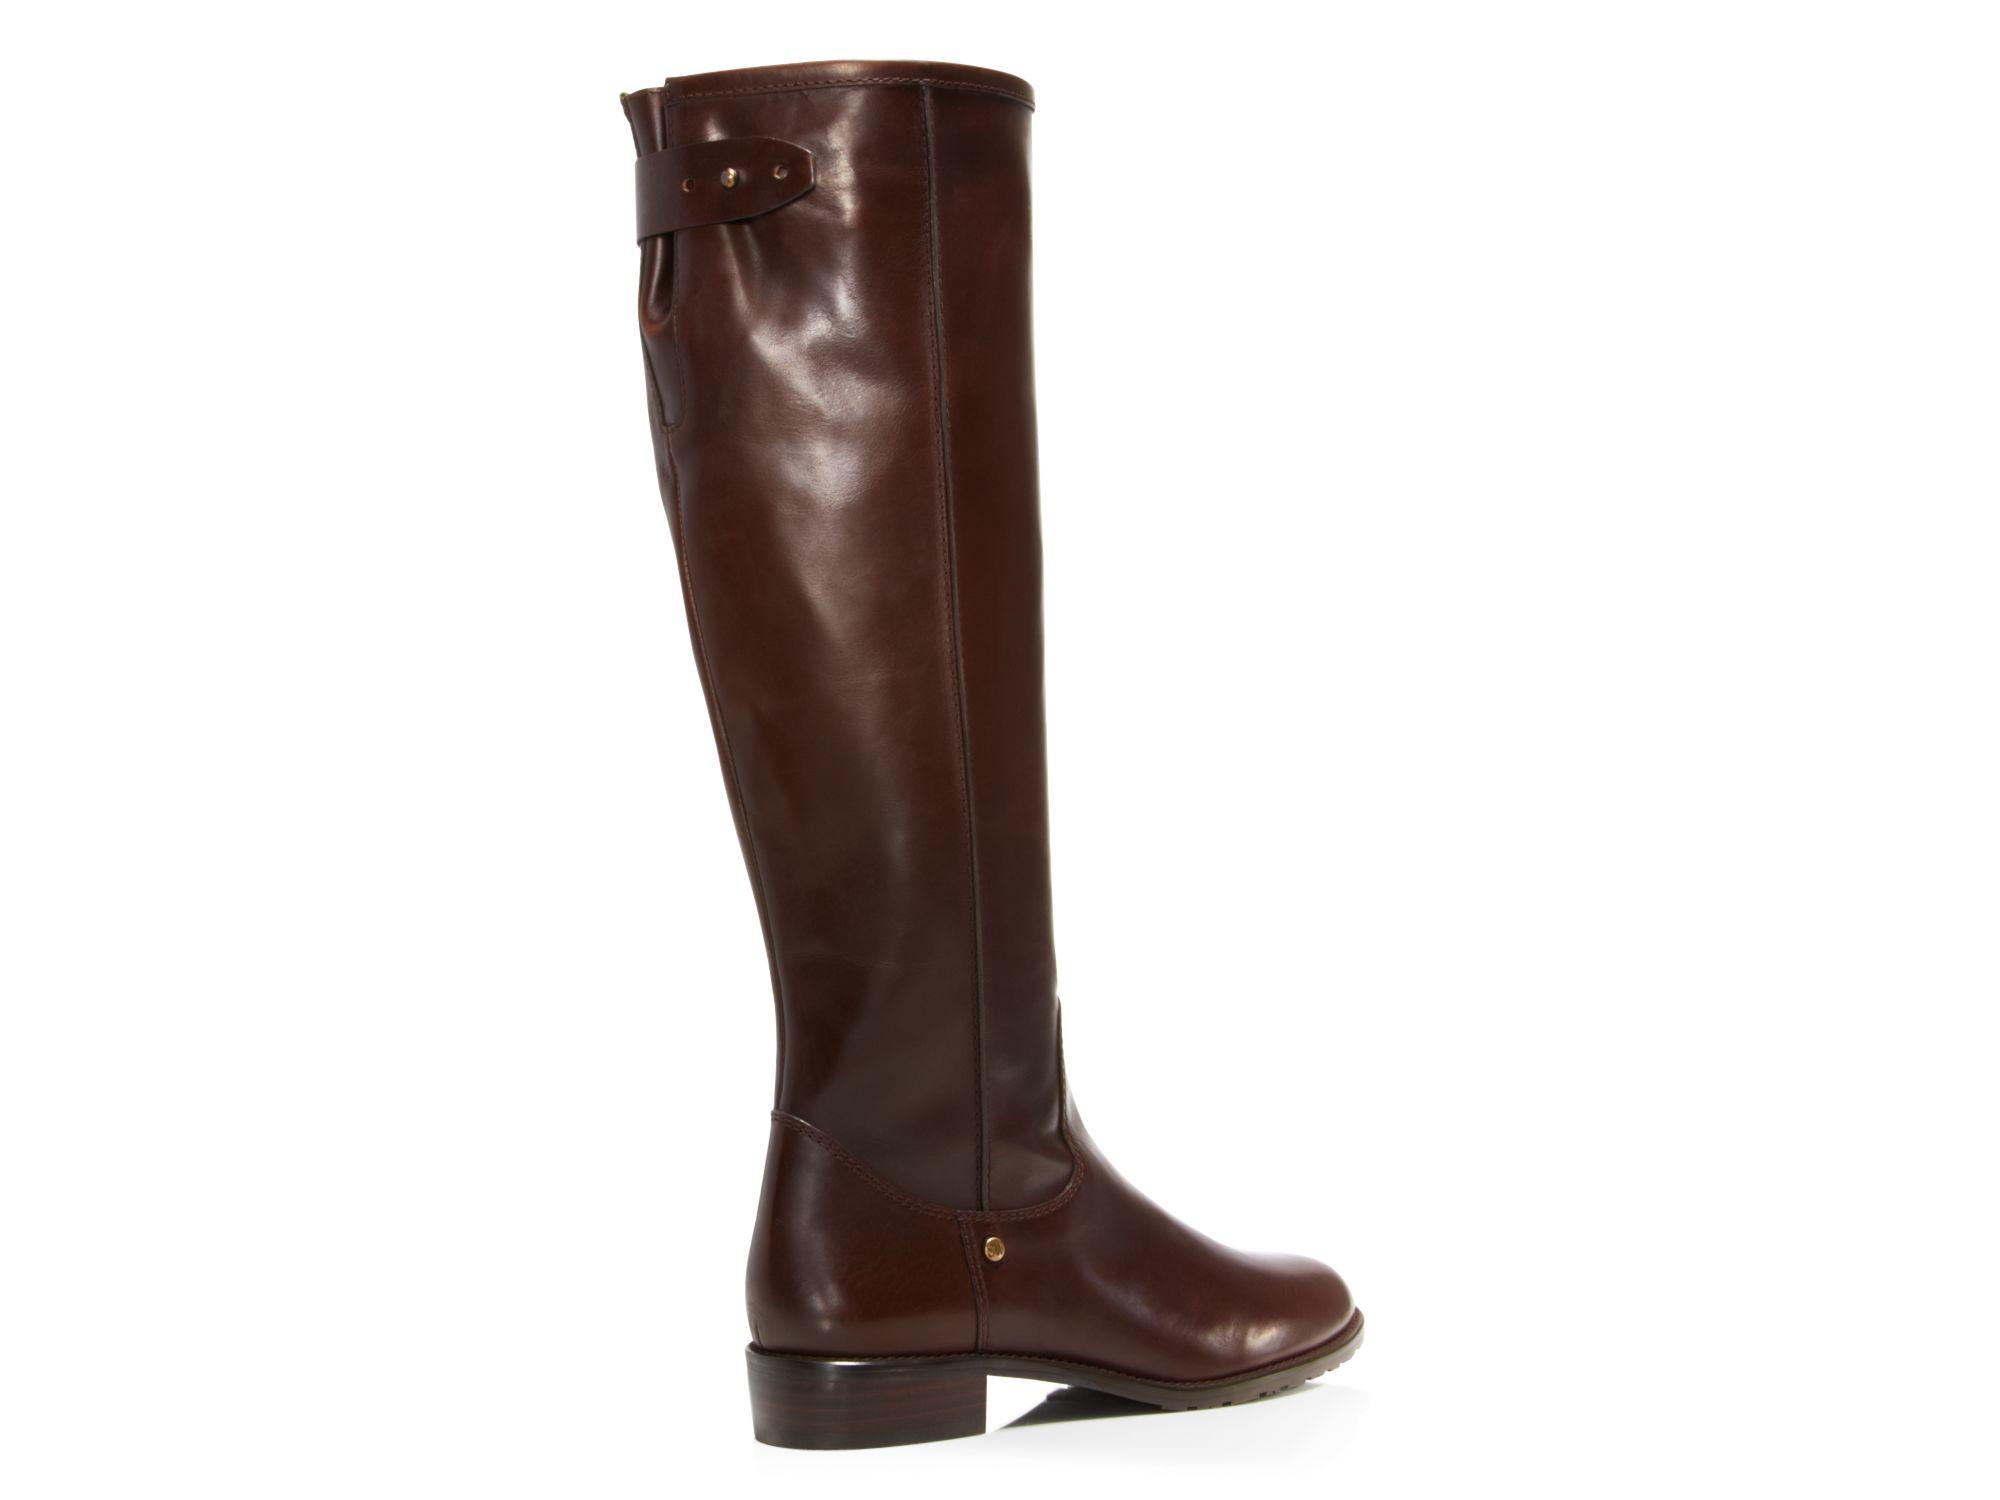 Stuart weitzman Riding Boots - Gentrylo High Shaft in Brown | Lyst